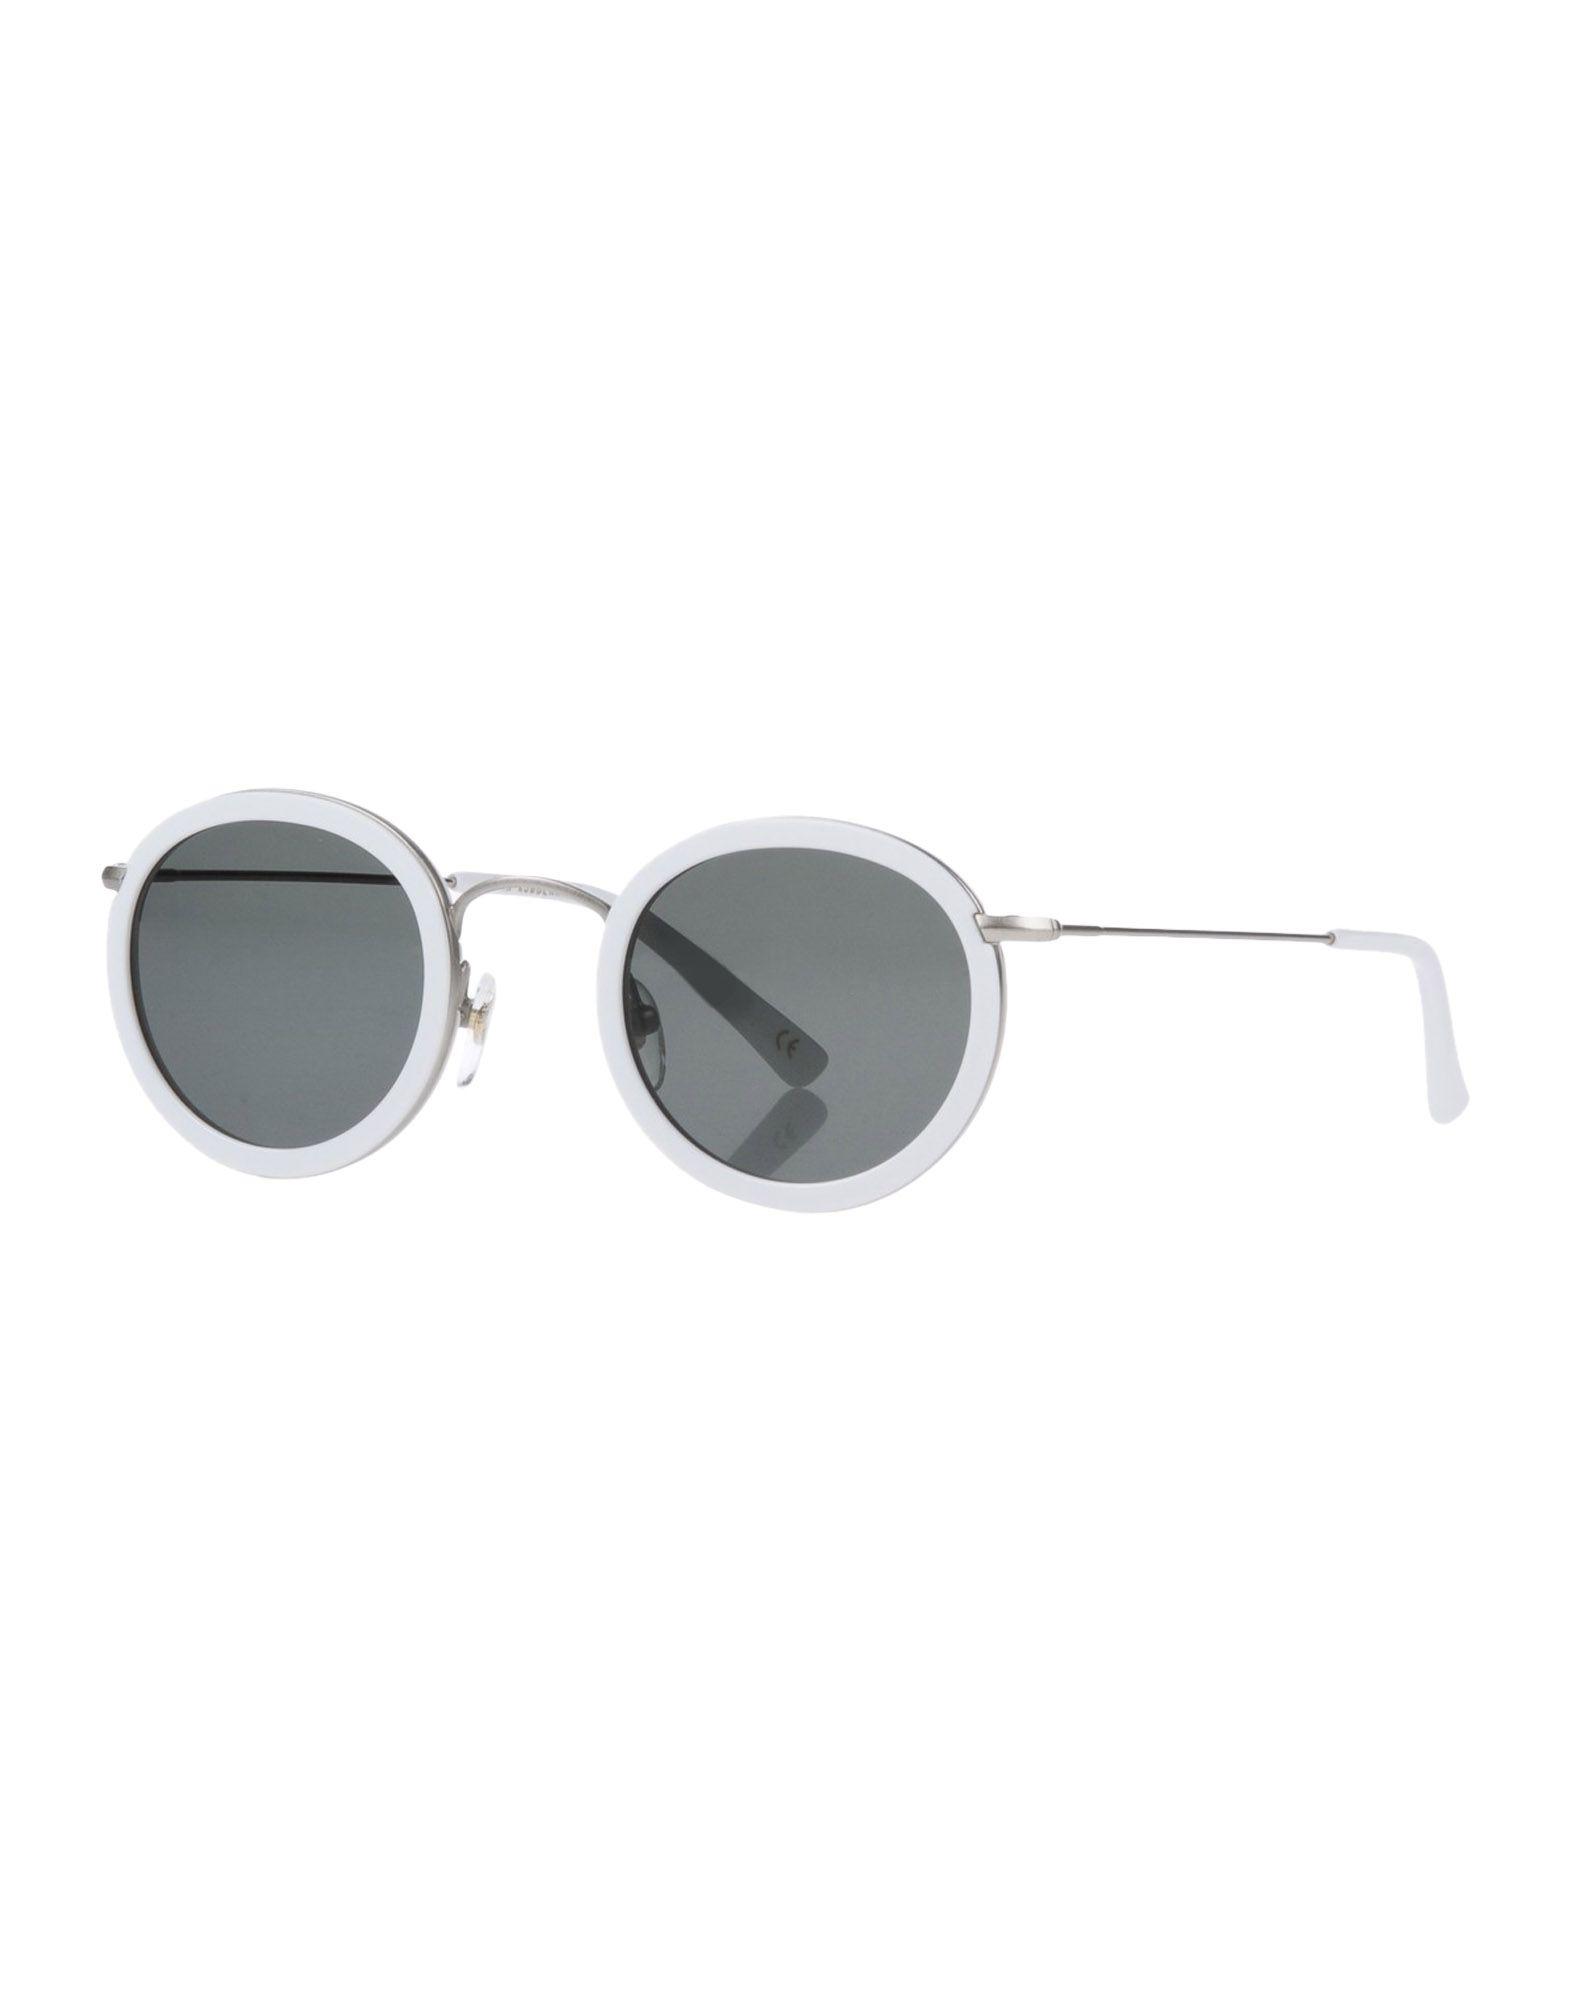 HAN KJØBENHAVN Sunglasses - Item 46580089